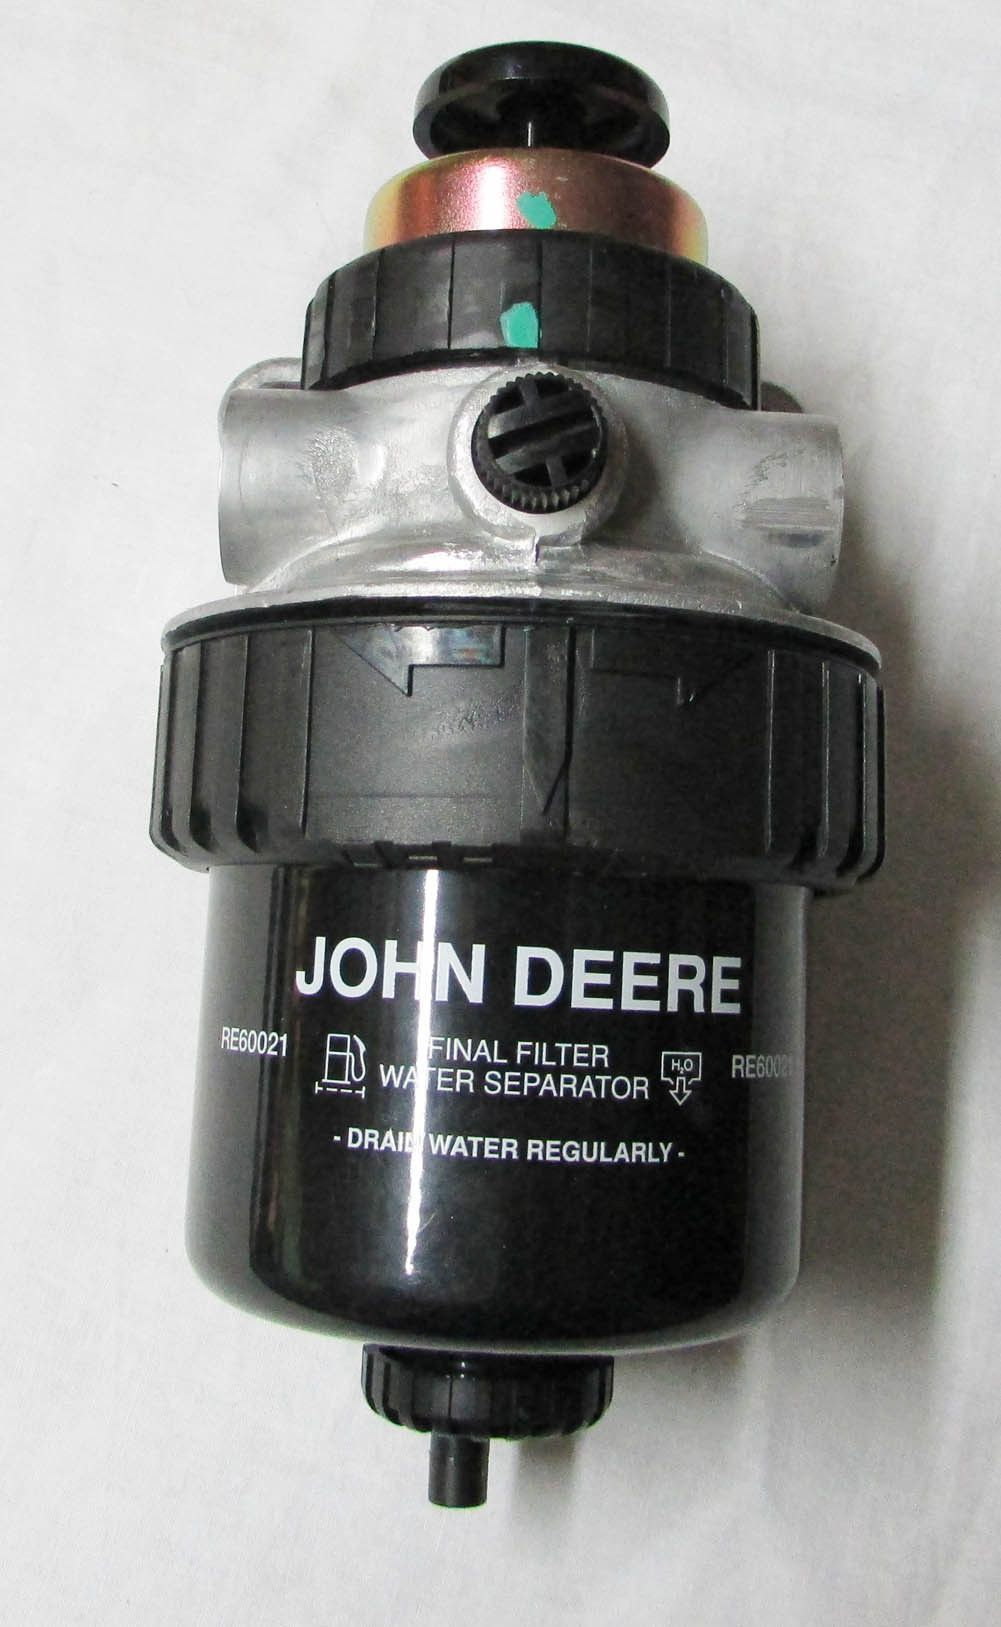 Genuine John Deere Oem Fuel Filter Re67225 Products Pinterest Filters